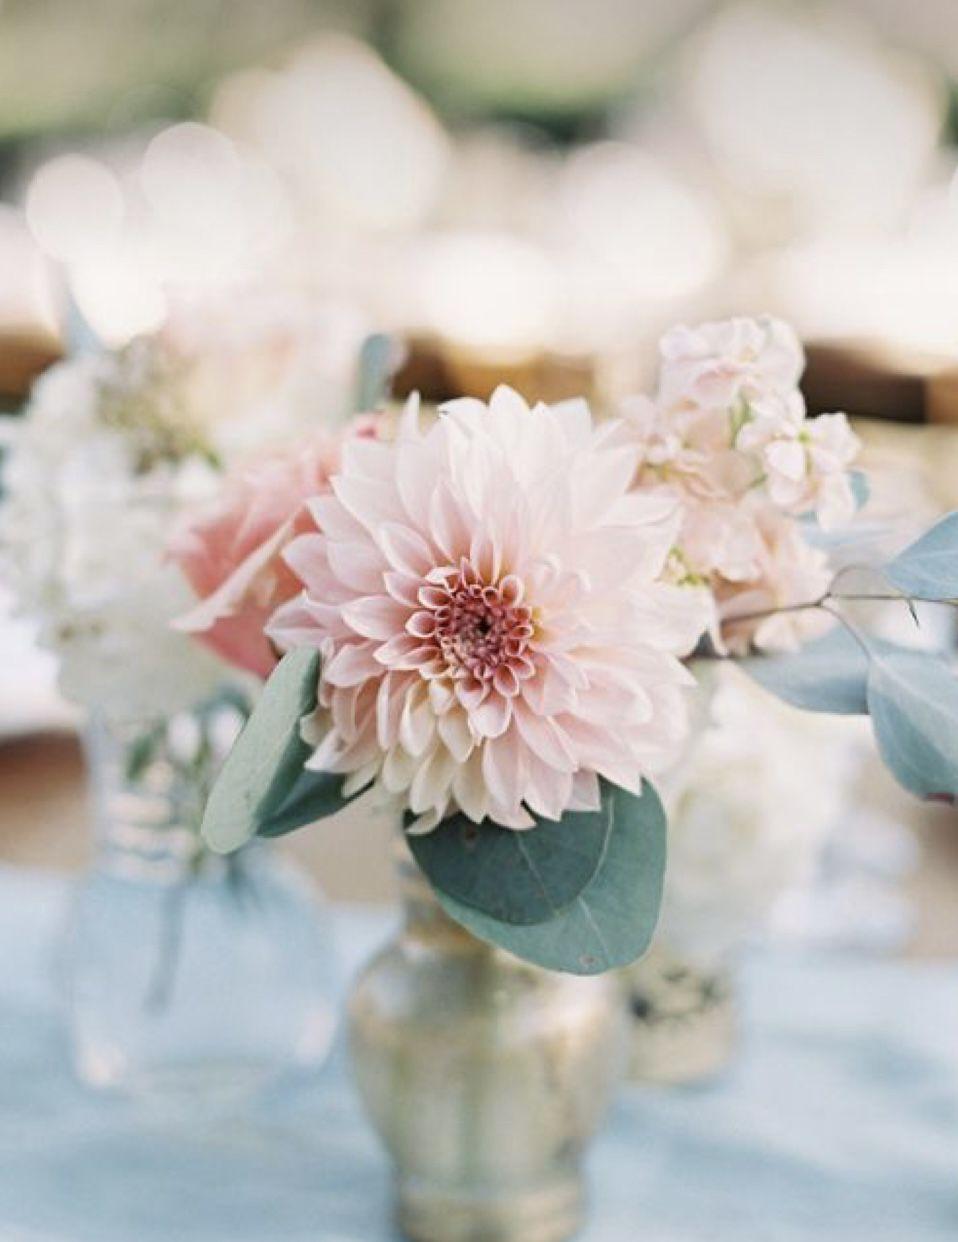 Wedding dahlias White, Blush And Pink Dahlias